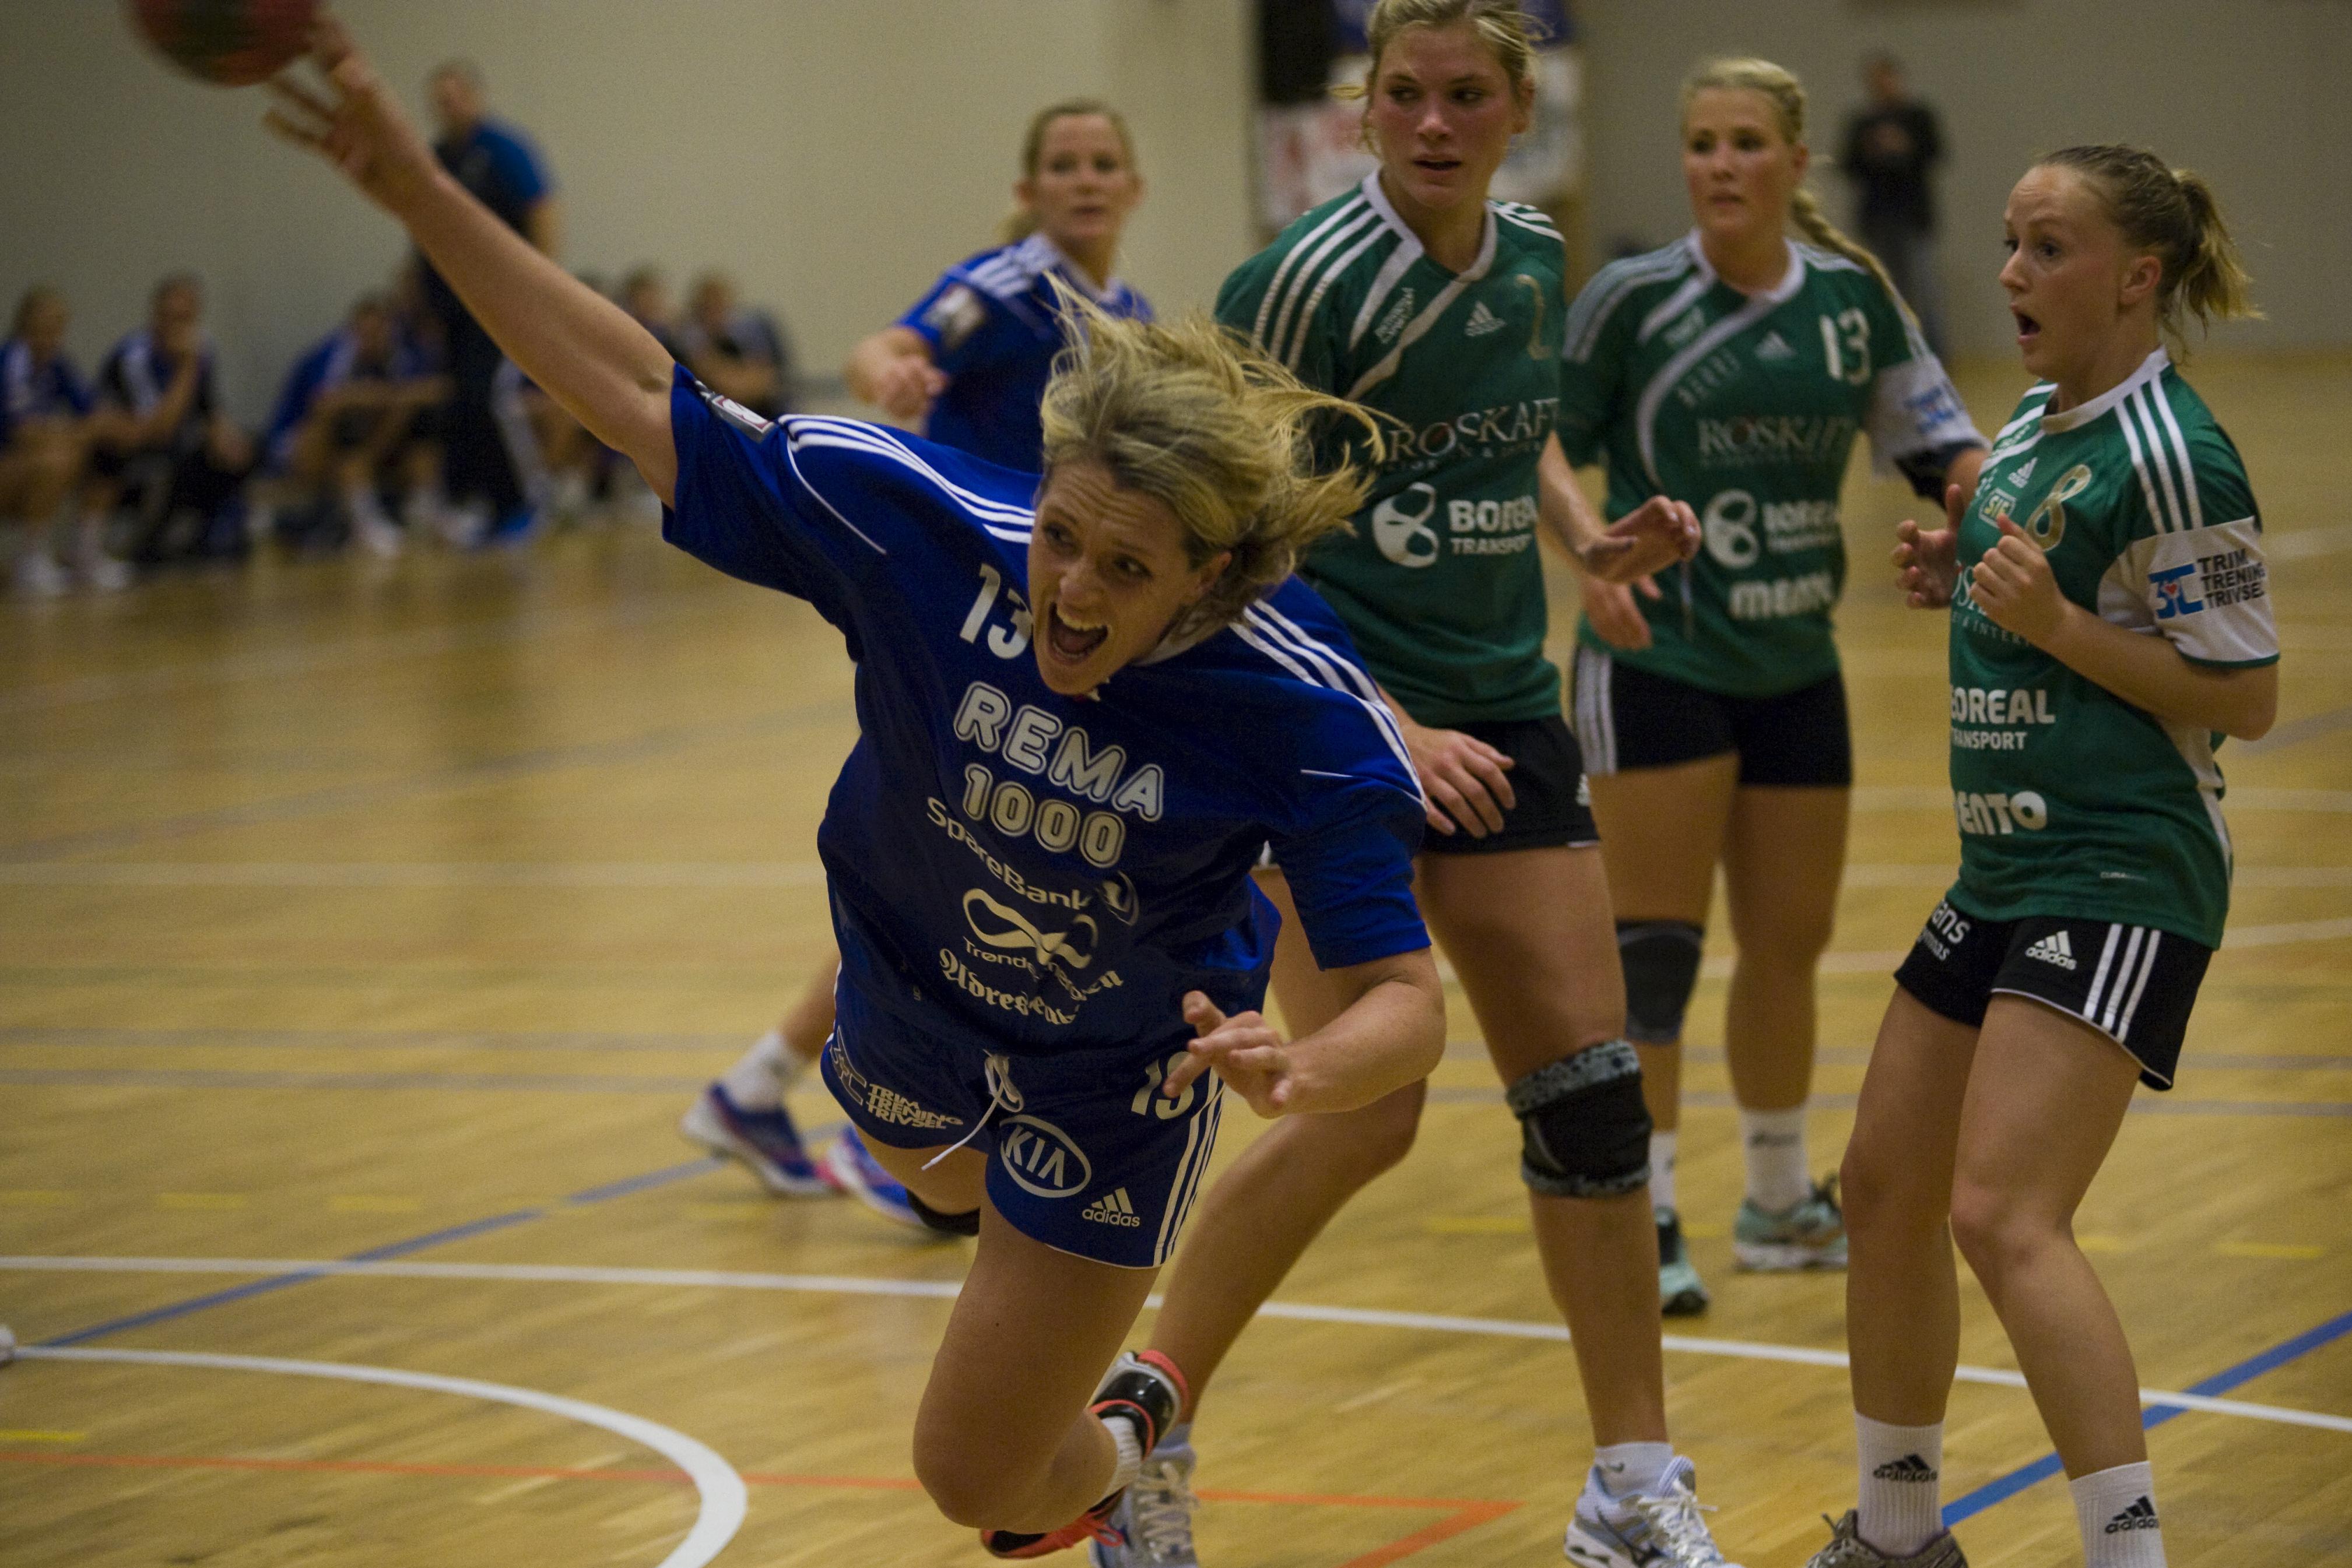 Sara Andersson spilte en bra kamp både i angrep og forsvar. Foto: Håvard Loeng